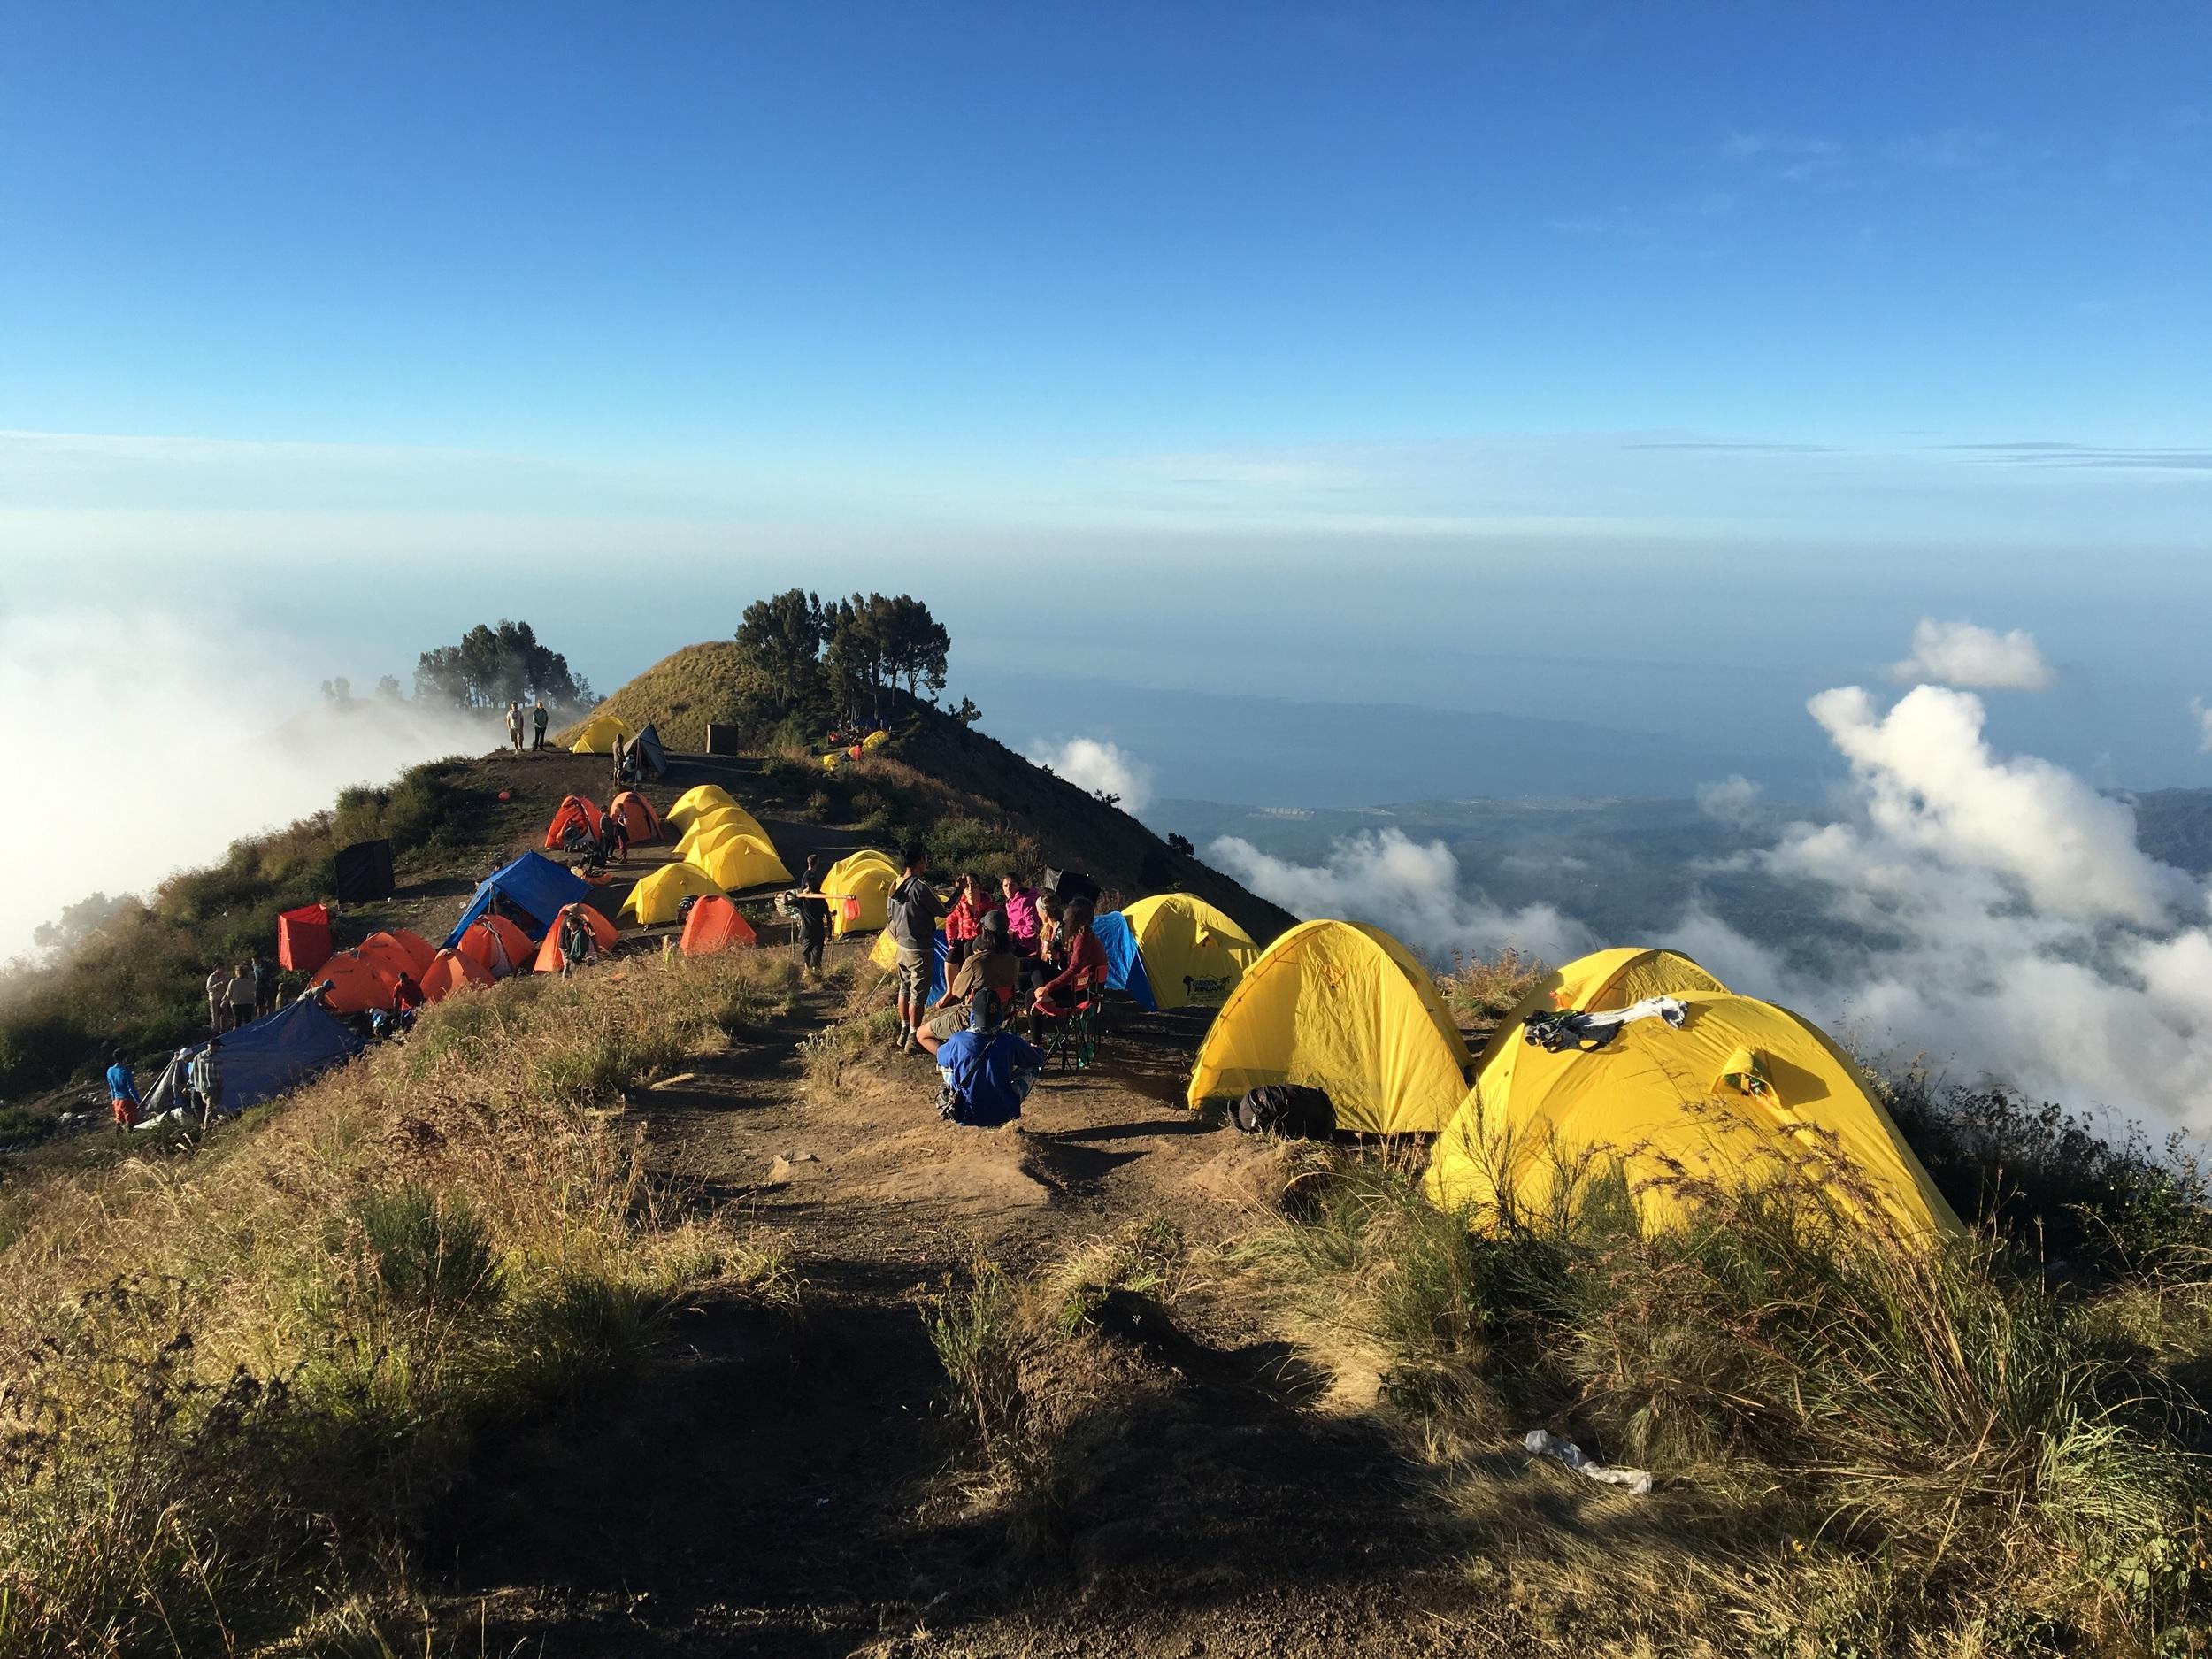 Camping just below the summit of Gunung Rinjani